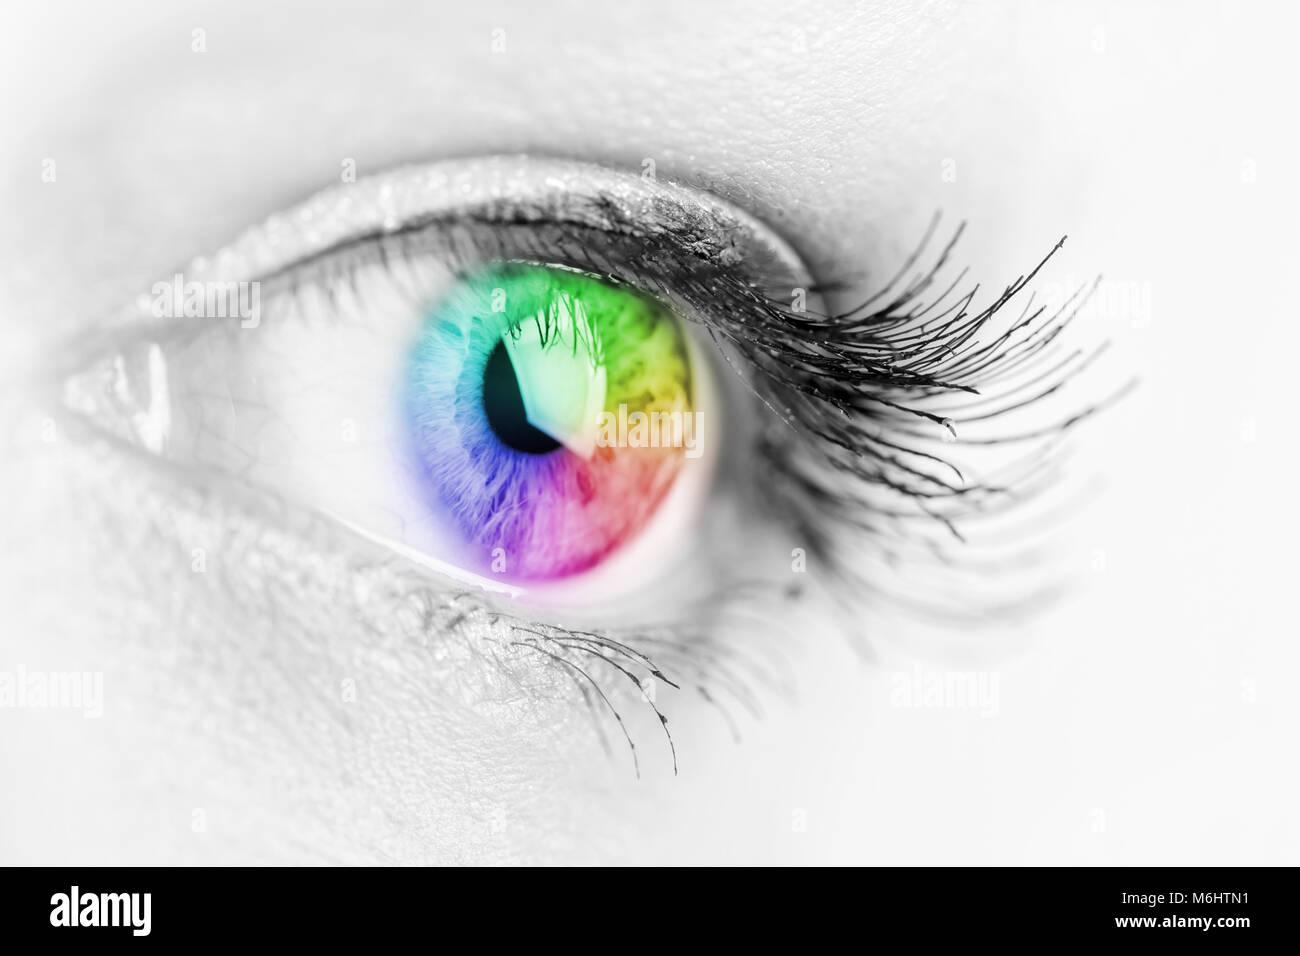 Eye Rainbow Stock Photos & Eye Rainbow Stock Images - Alamy